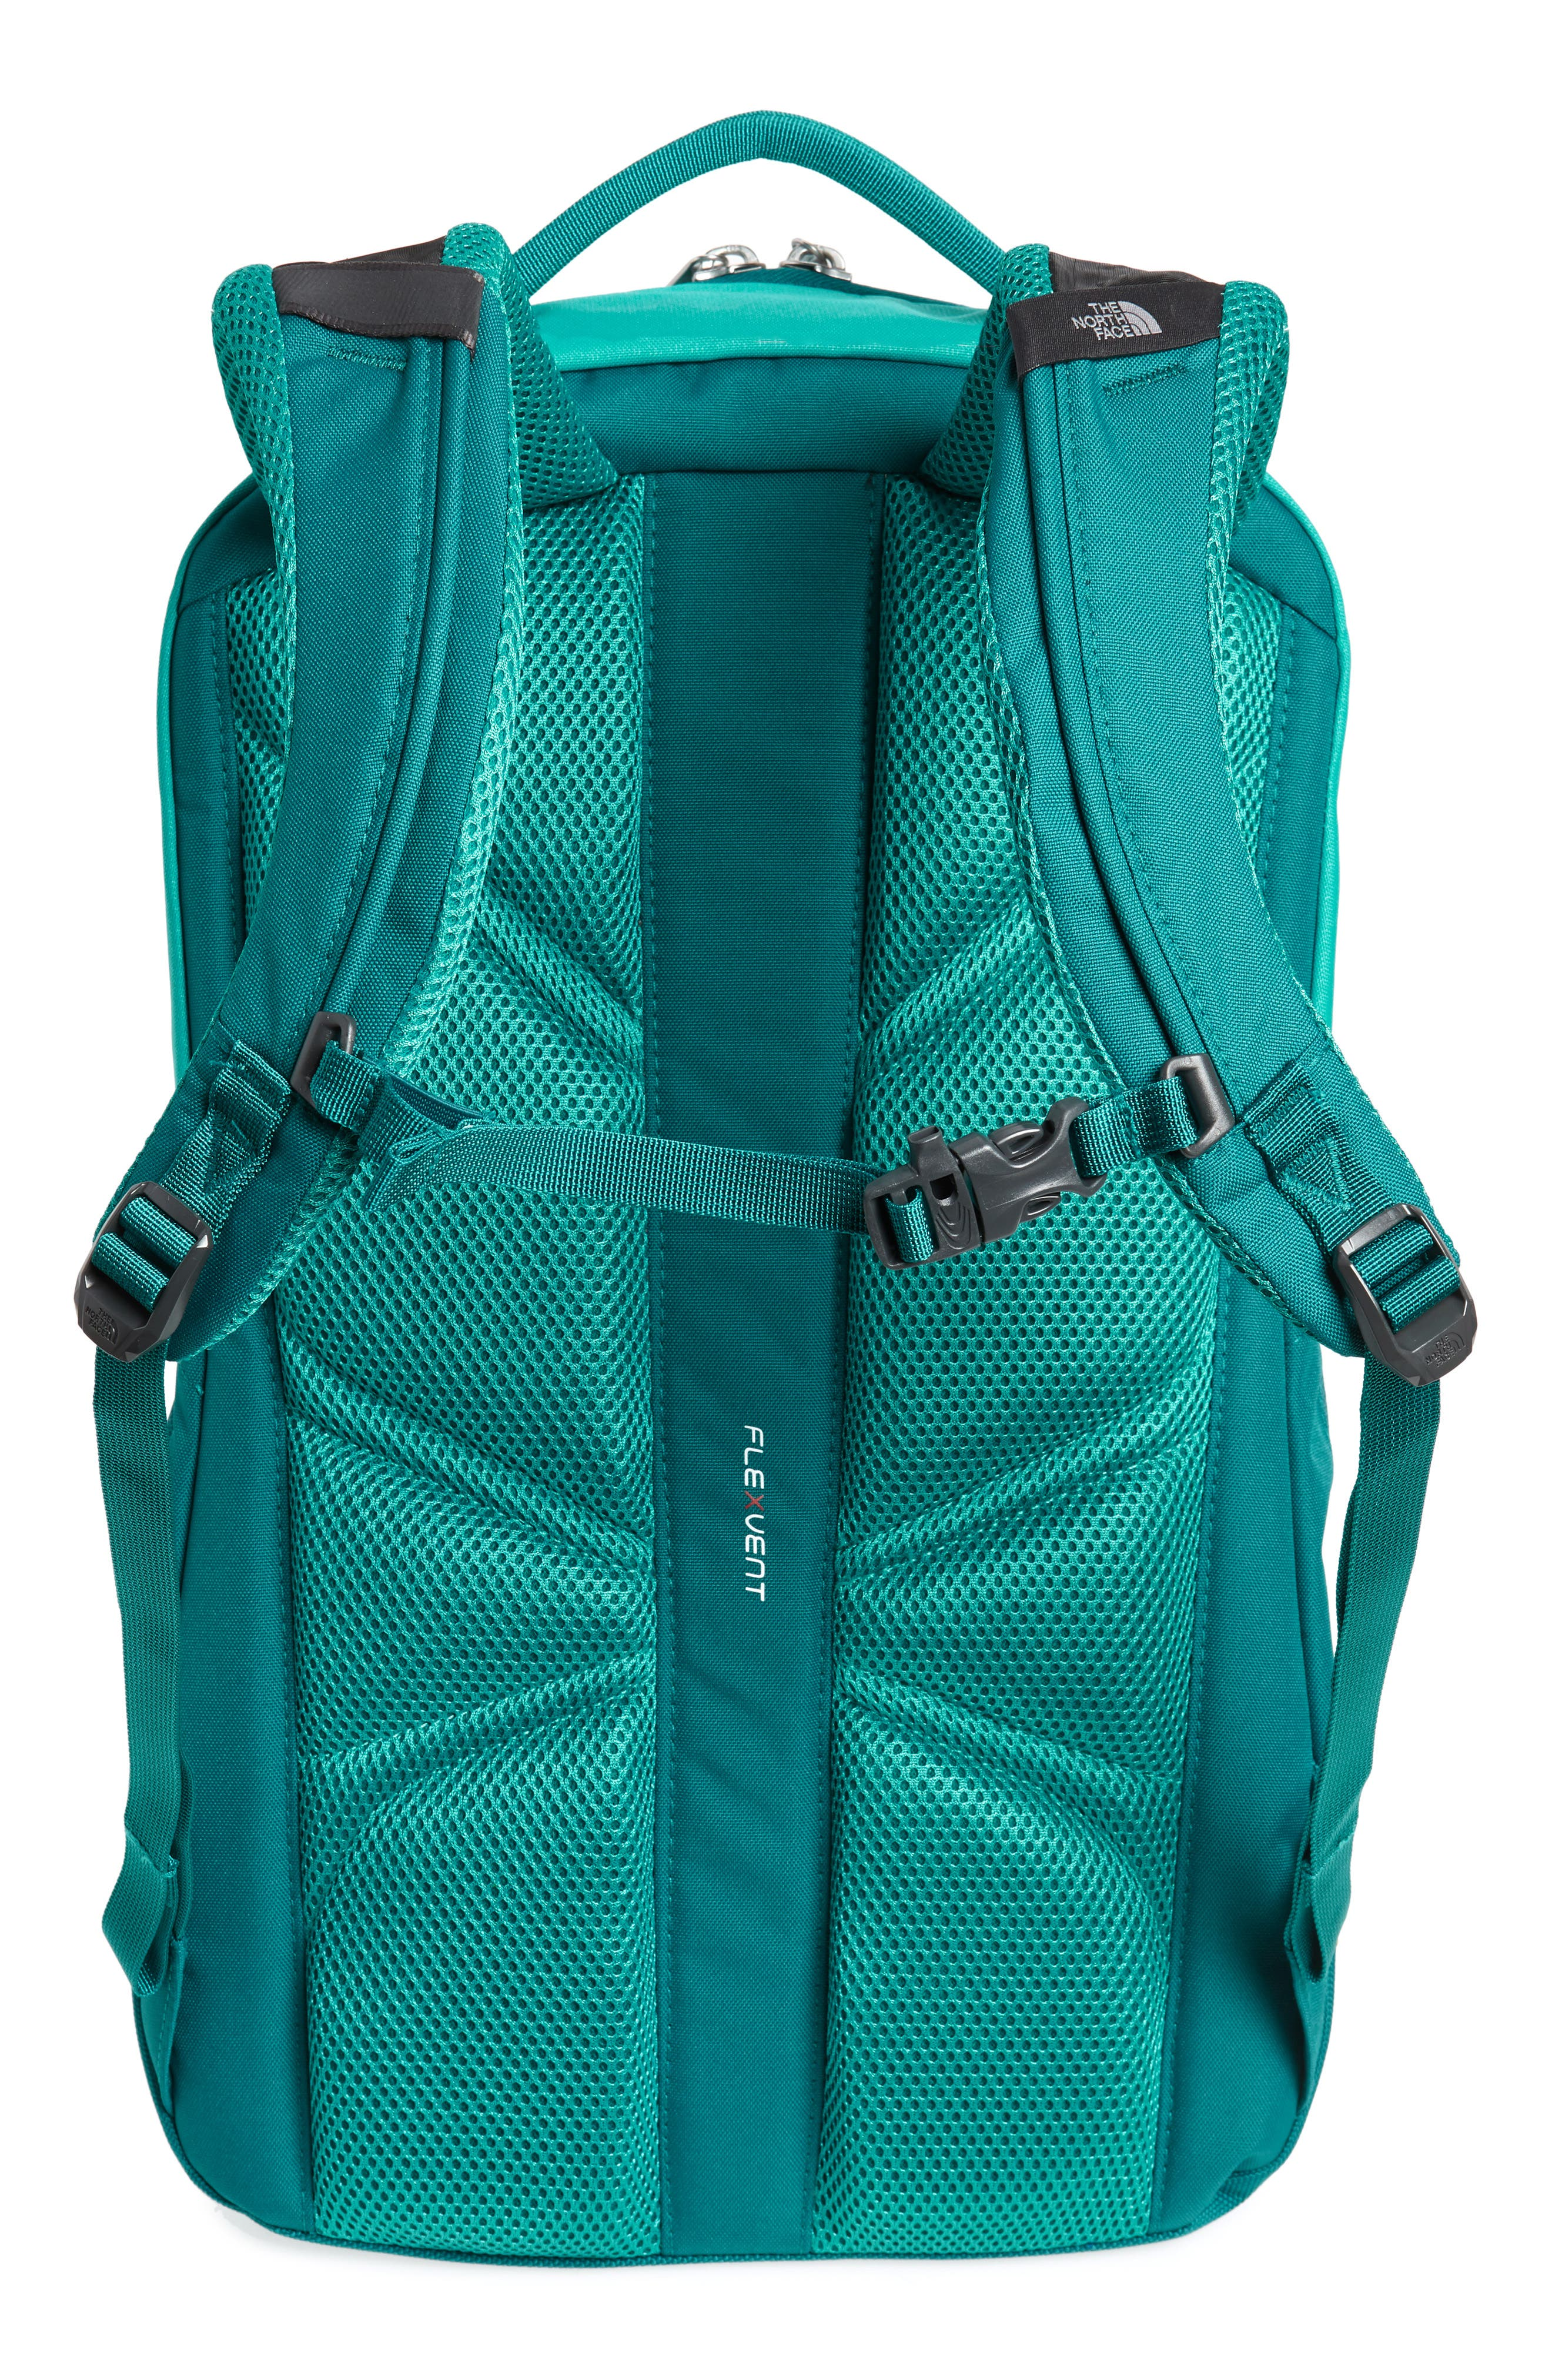 Vault Backpack,                             Alternate thumbnail 2, color,                             Kokomo Green/ Everglade